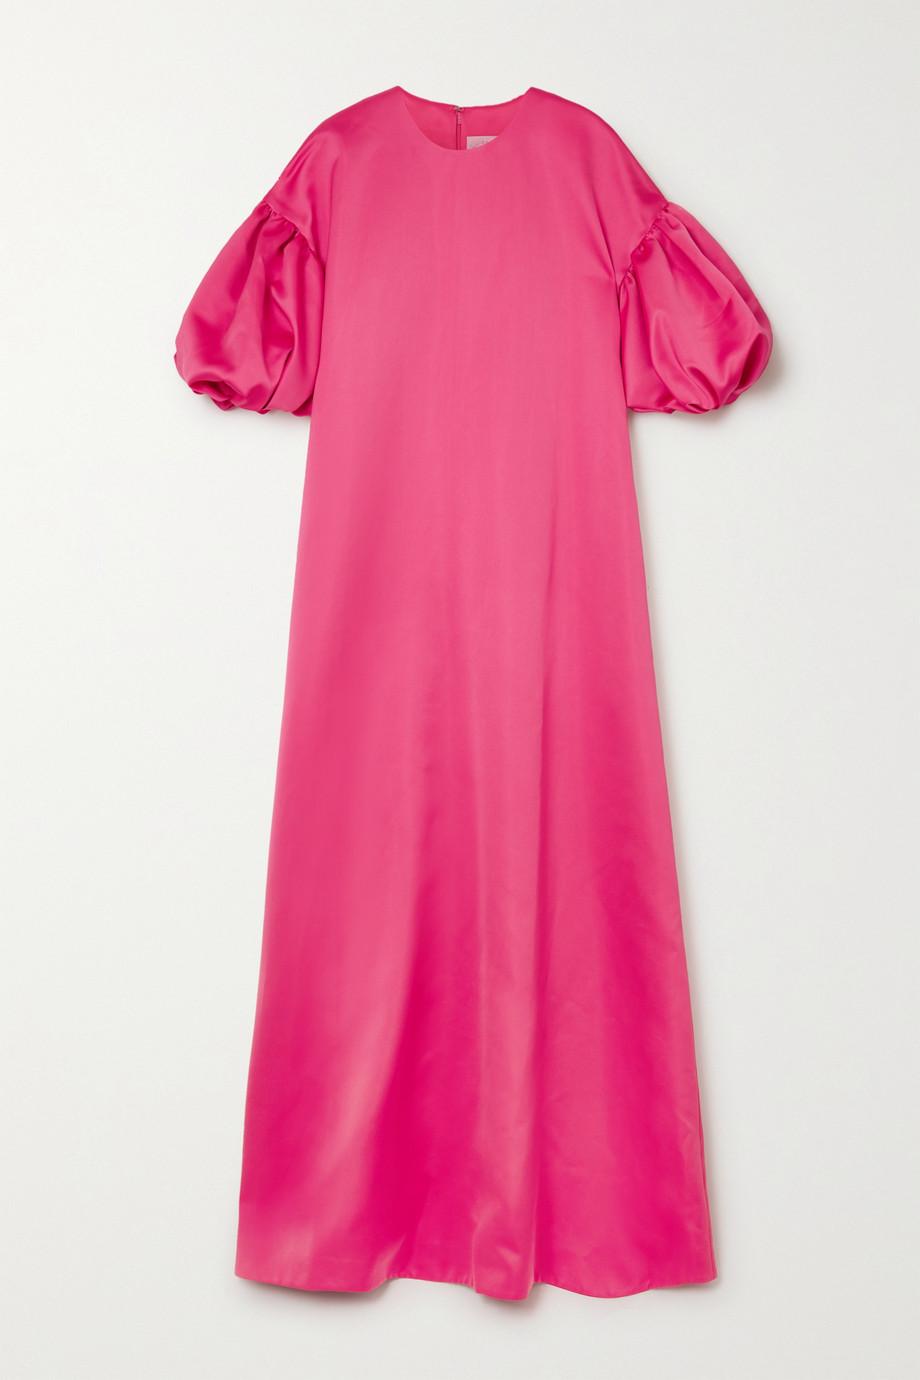 Huishan Zhang Celeste Robe aus Satin